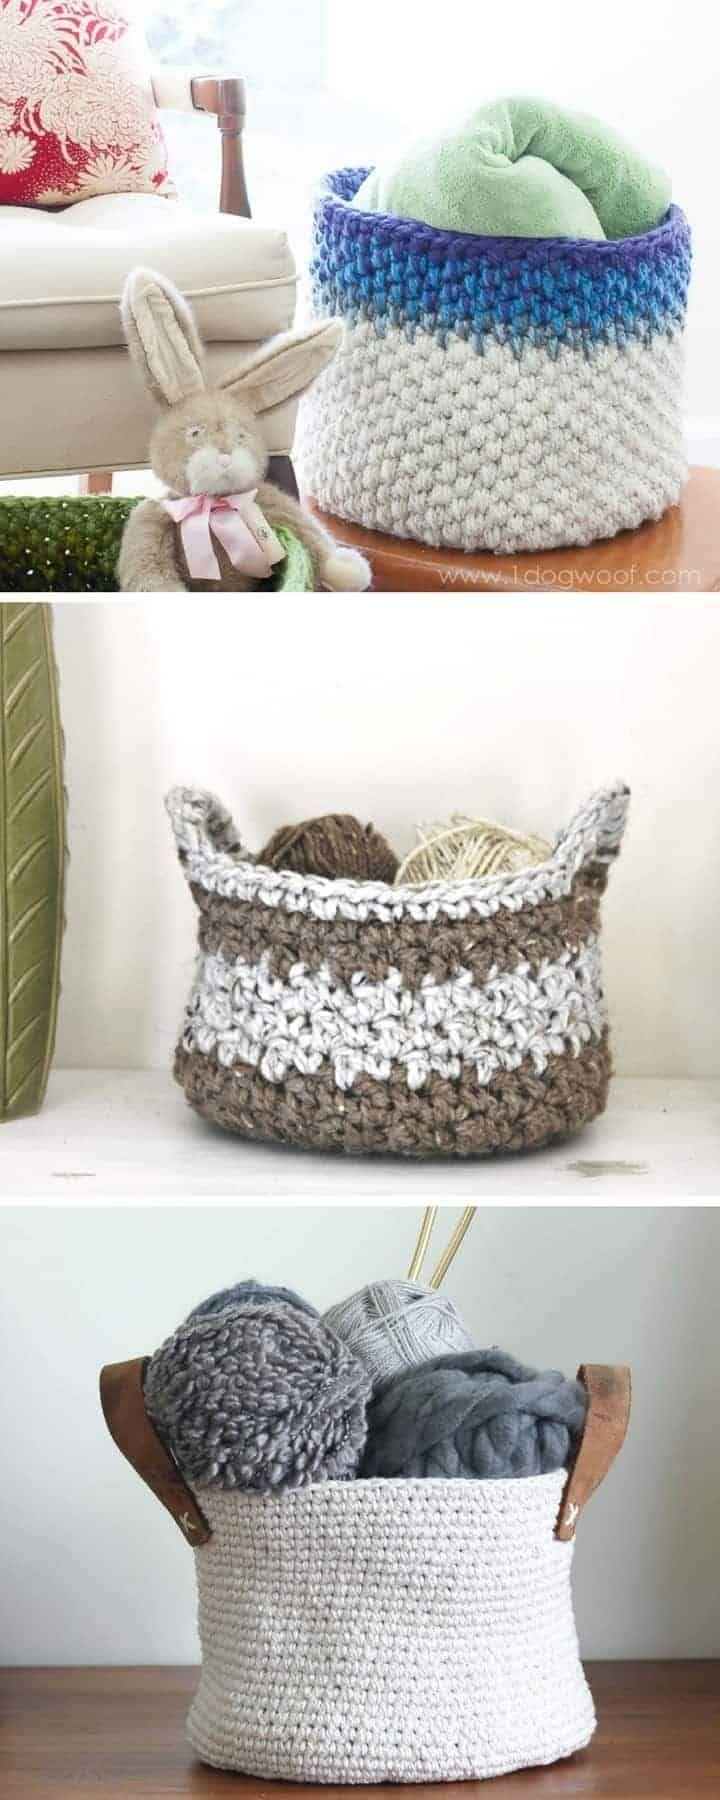 20 Free Crochet Basket Patterns | crochet 42 | Pinterest | Crochet ...